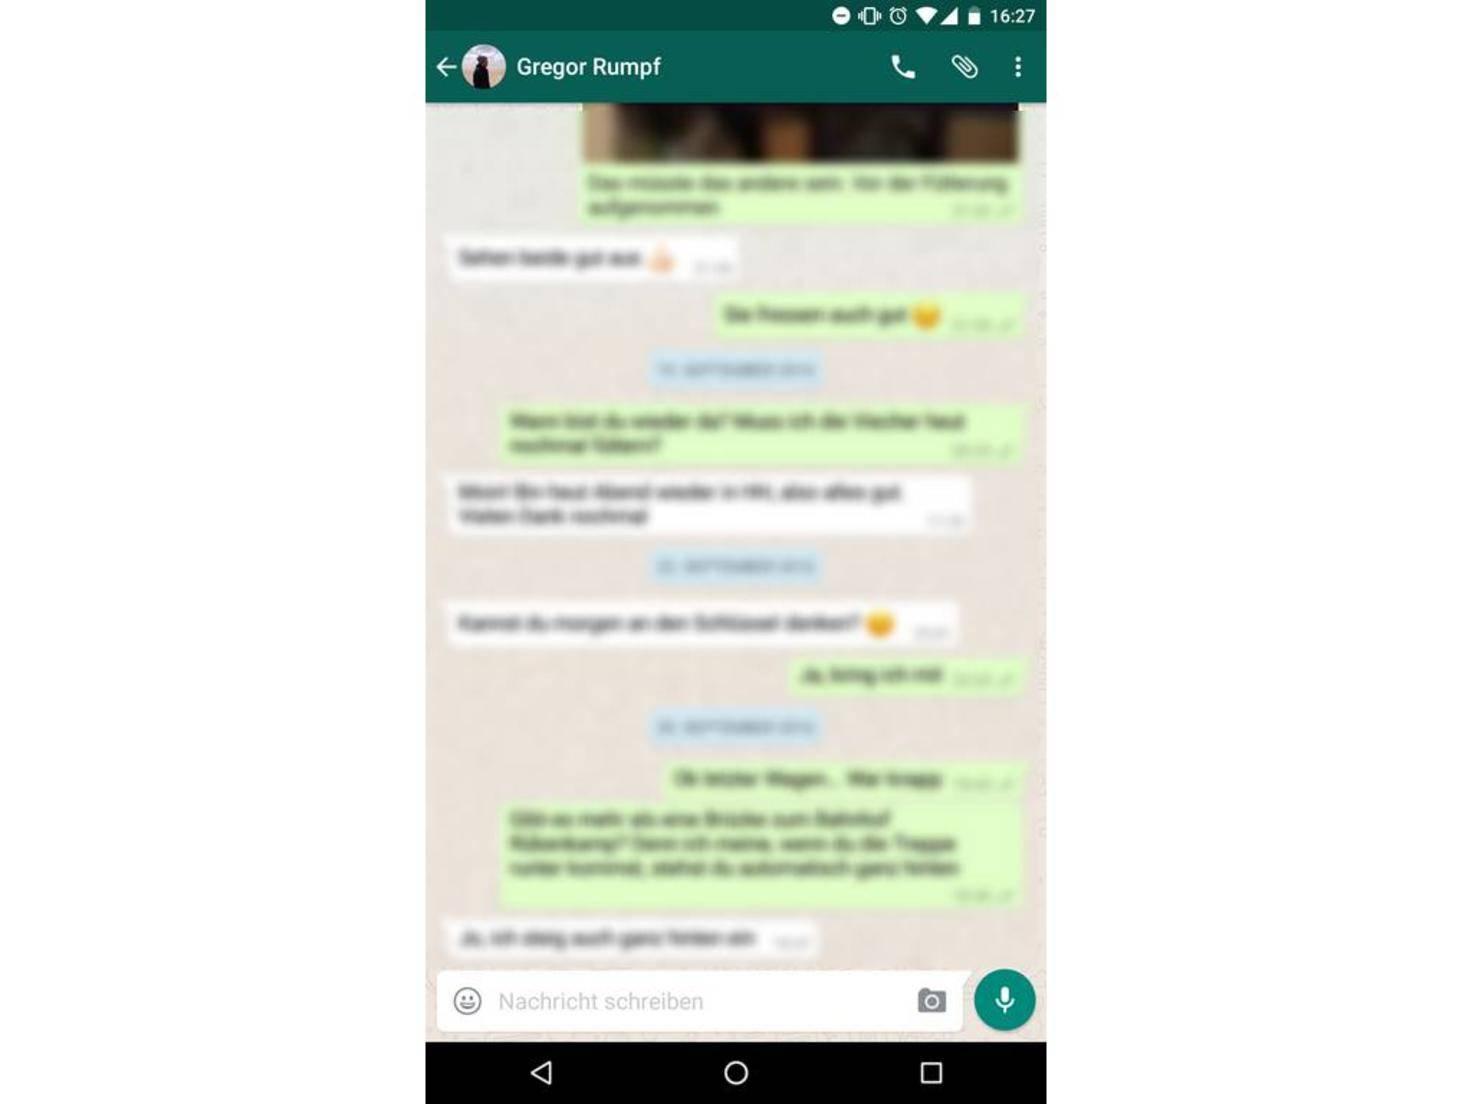 WhatsApp Profilbilder 04.jpg